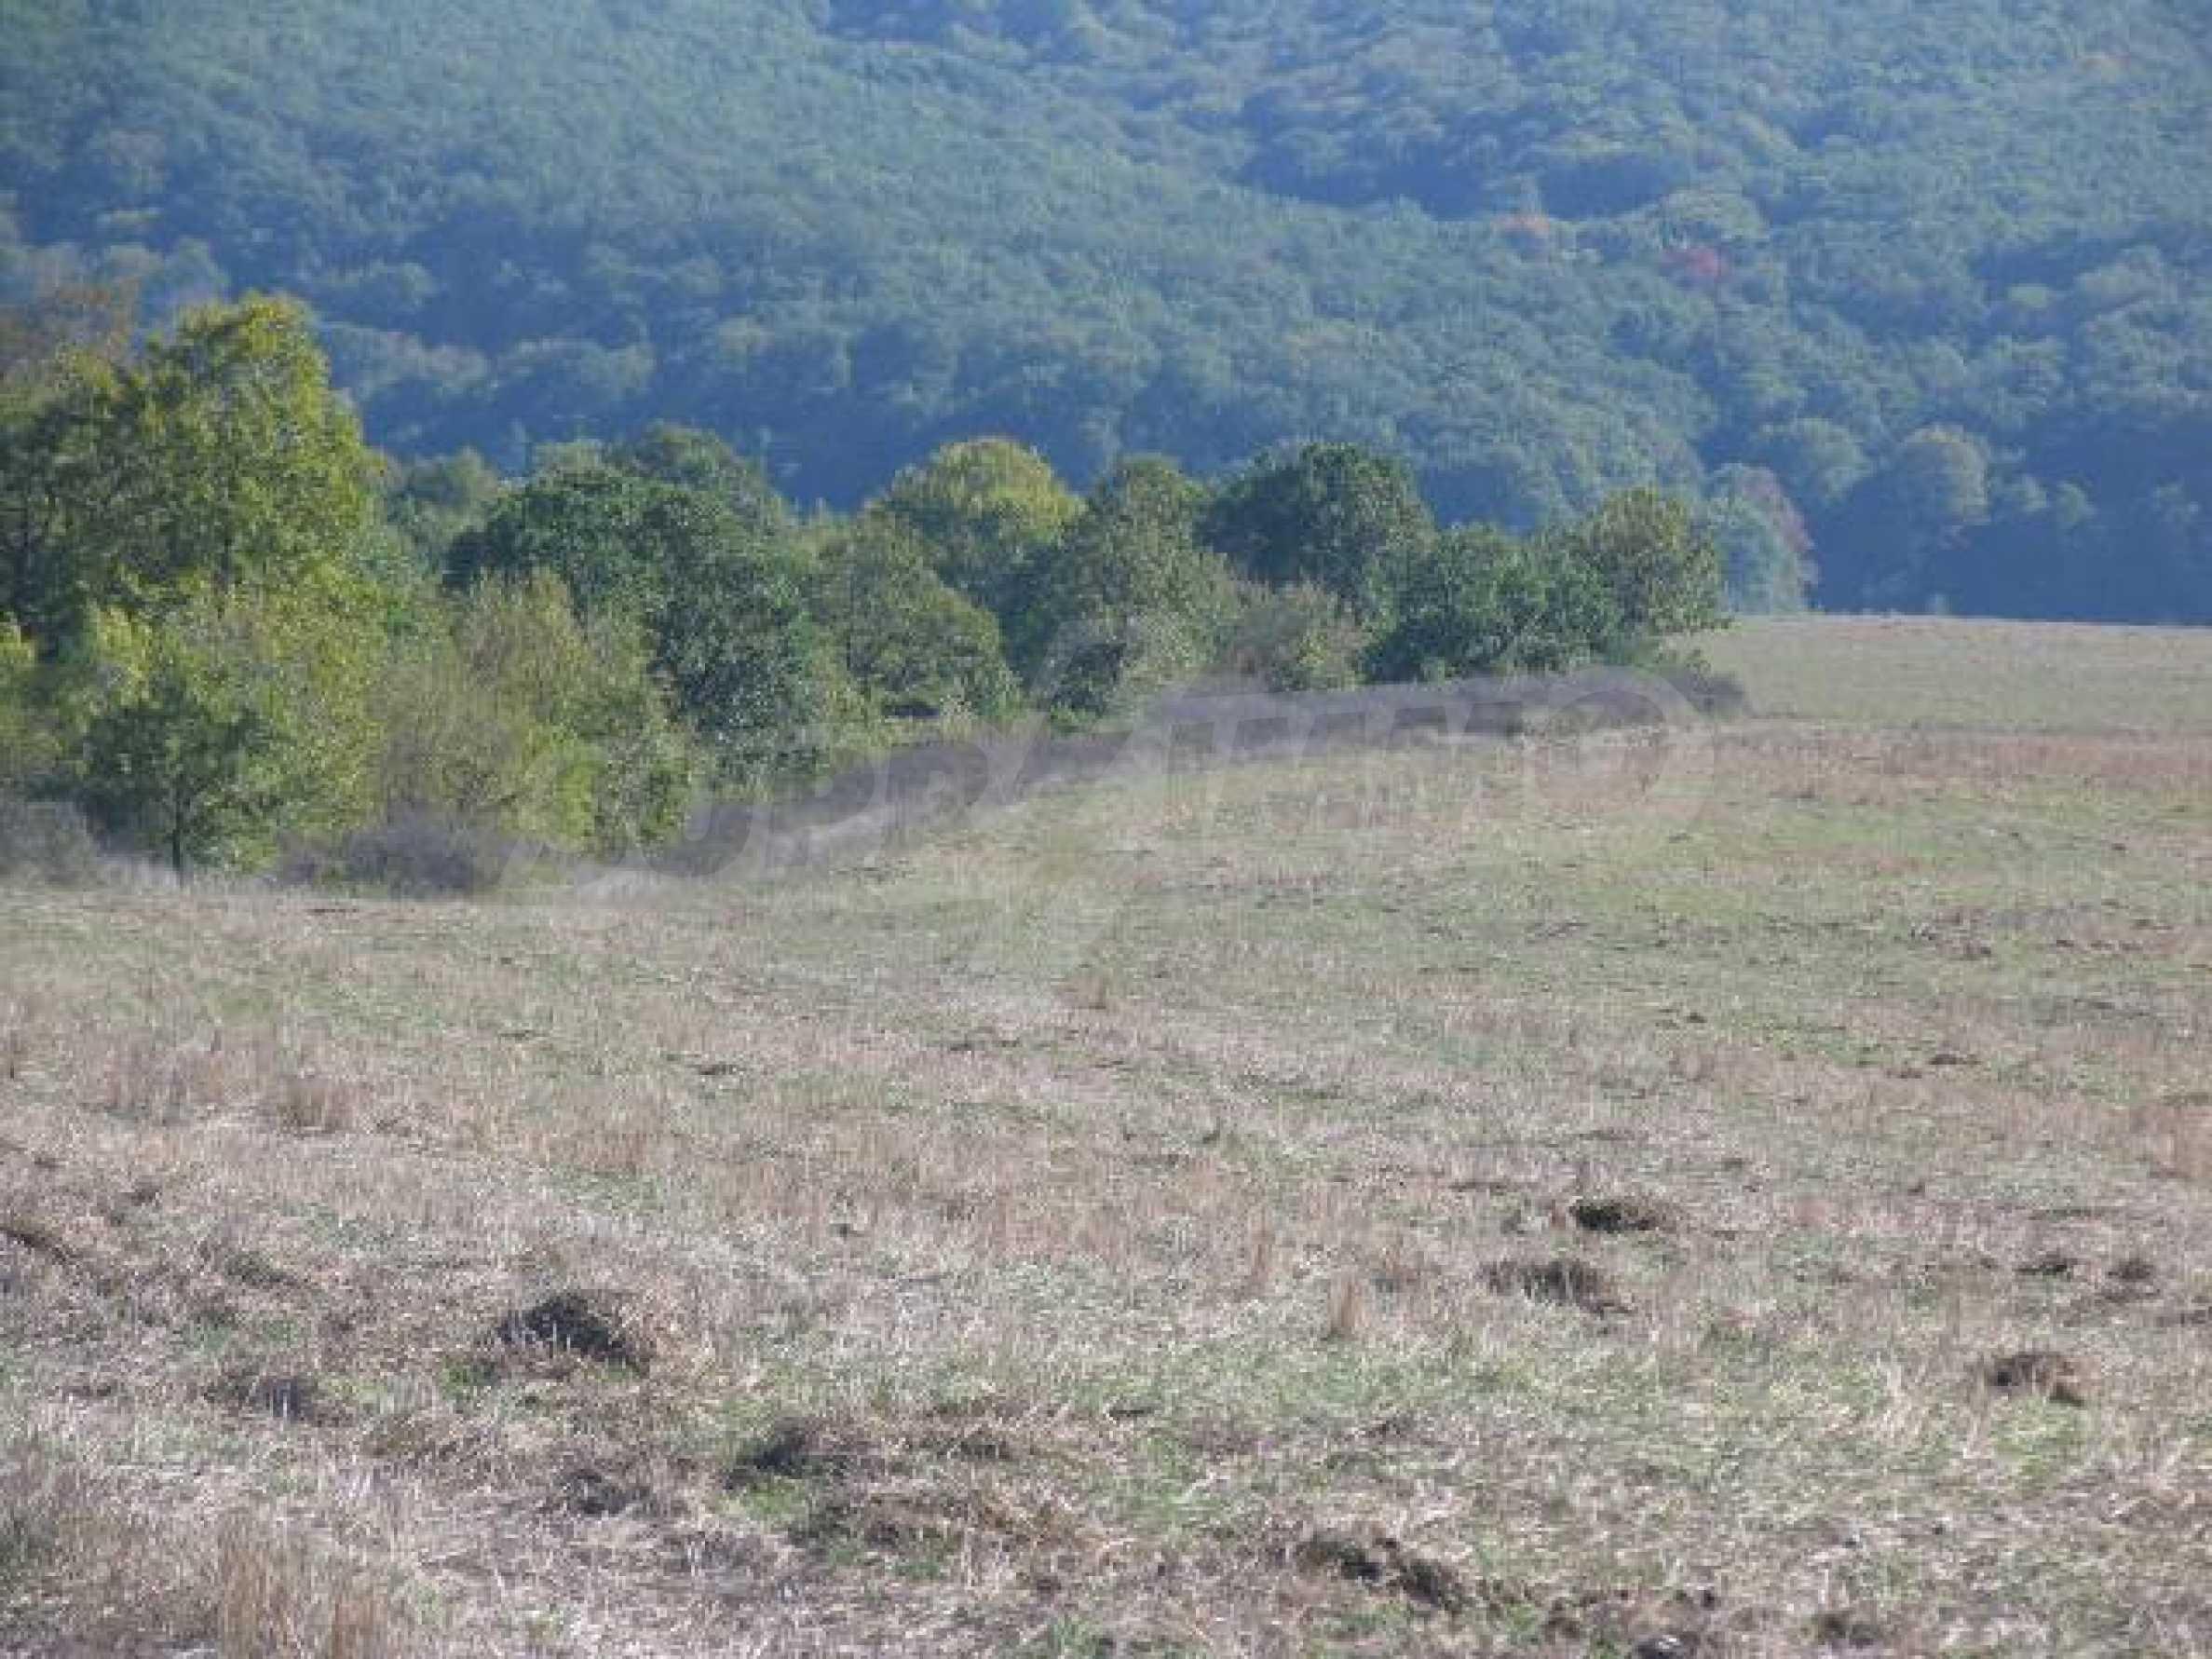 Development land for sale in Rudnik village